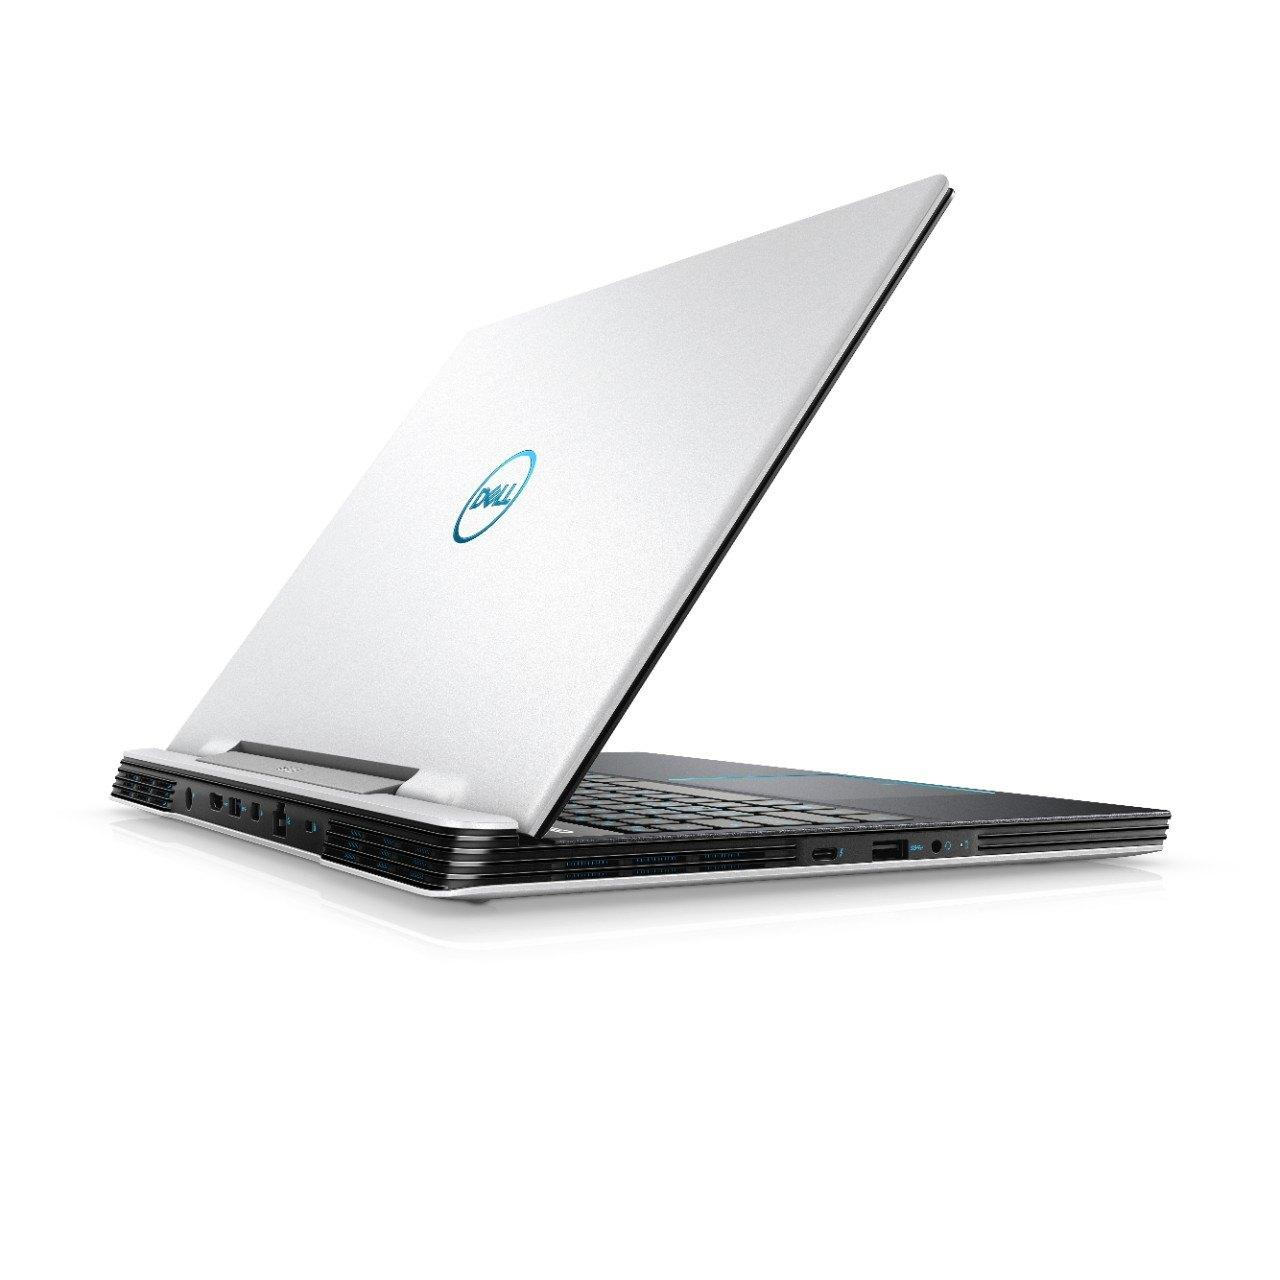 Dell G5 SE 5590 - i7-8750H, RAM 8GB, SSD 256GB, HDD 1TB, VGA RTX 2060 6GB, Màn 144Hz